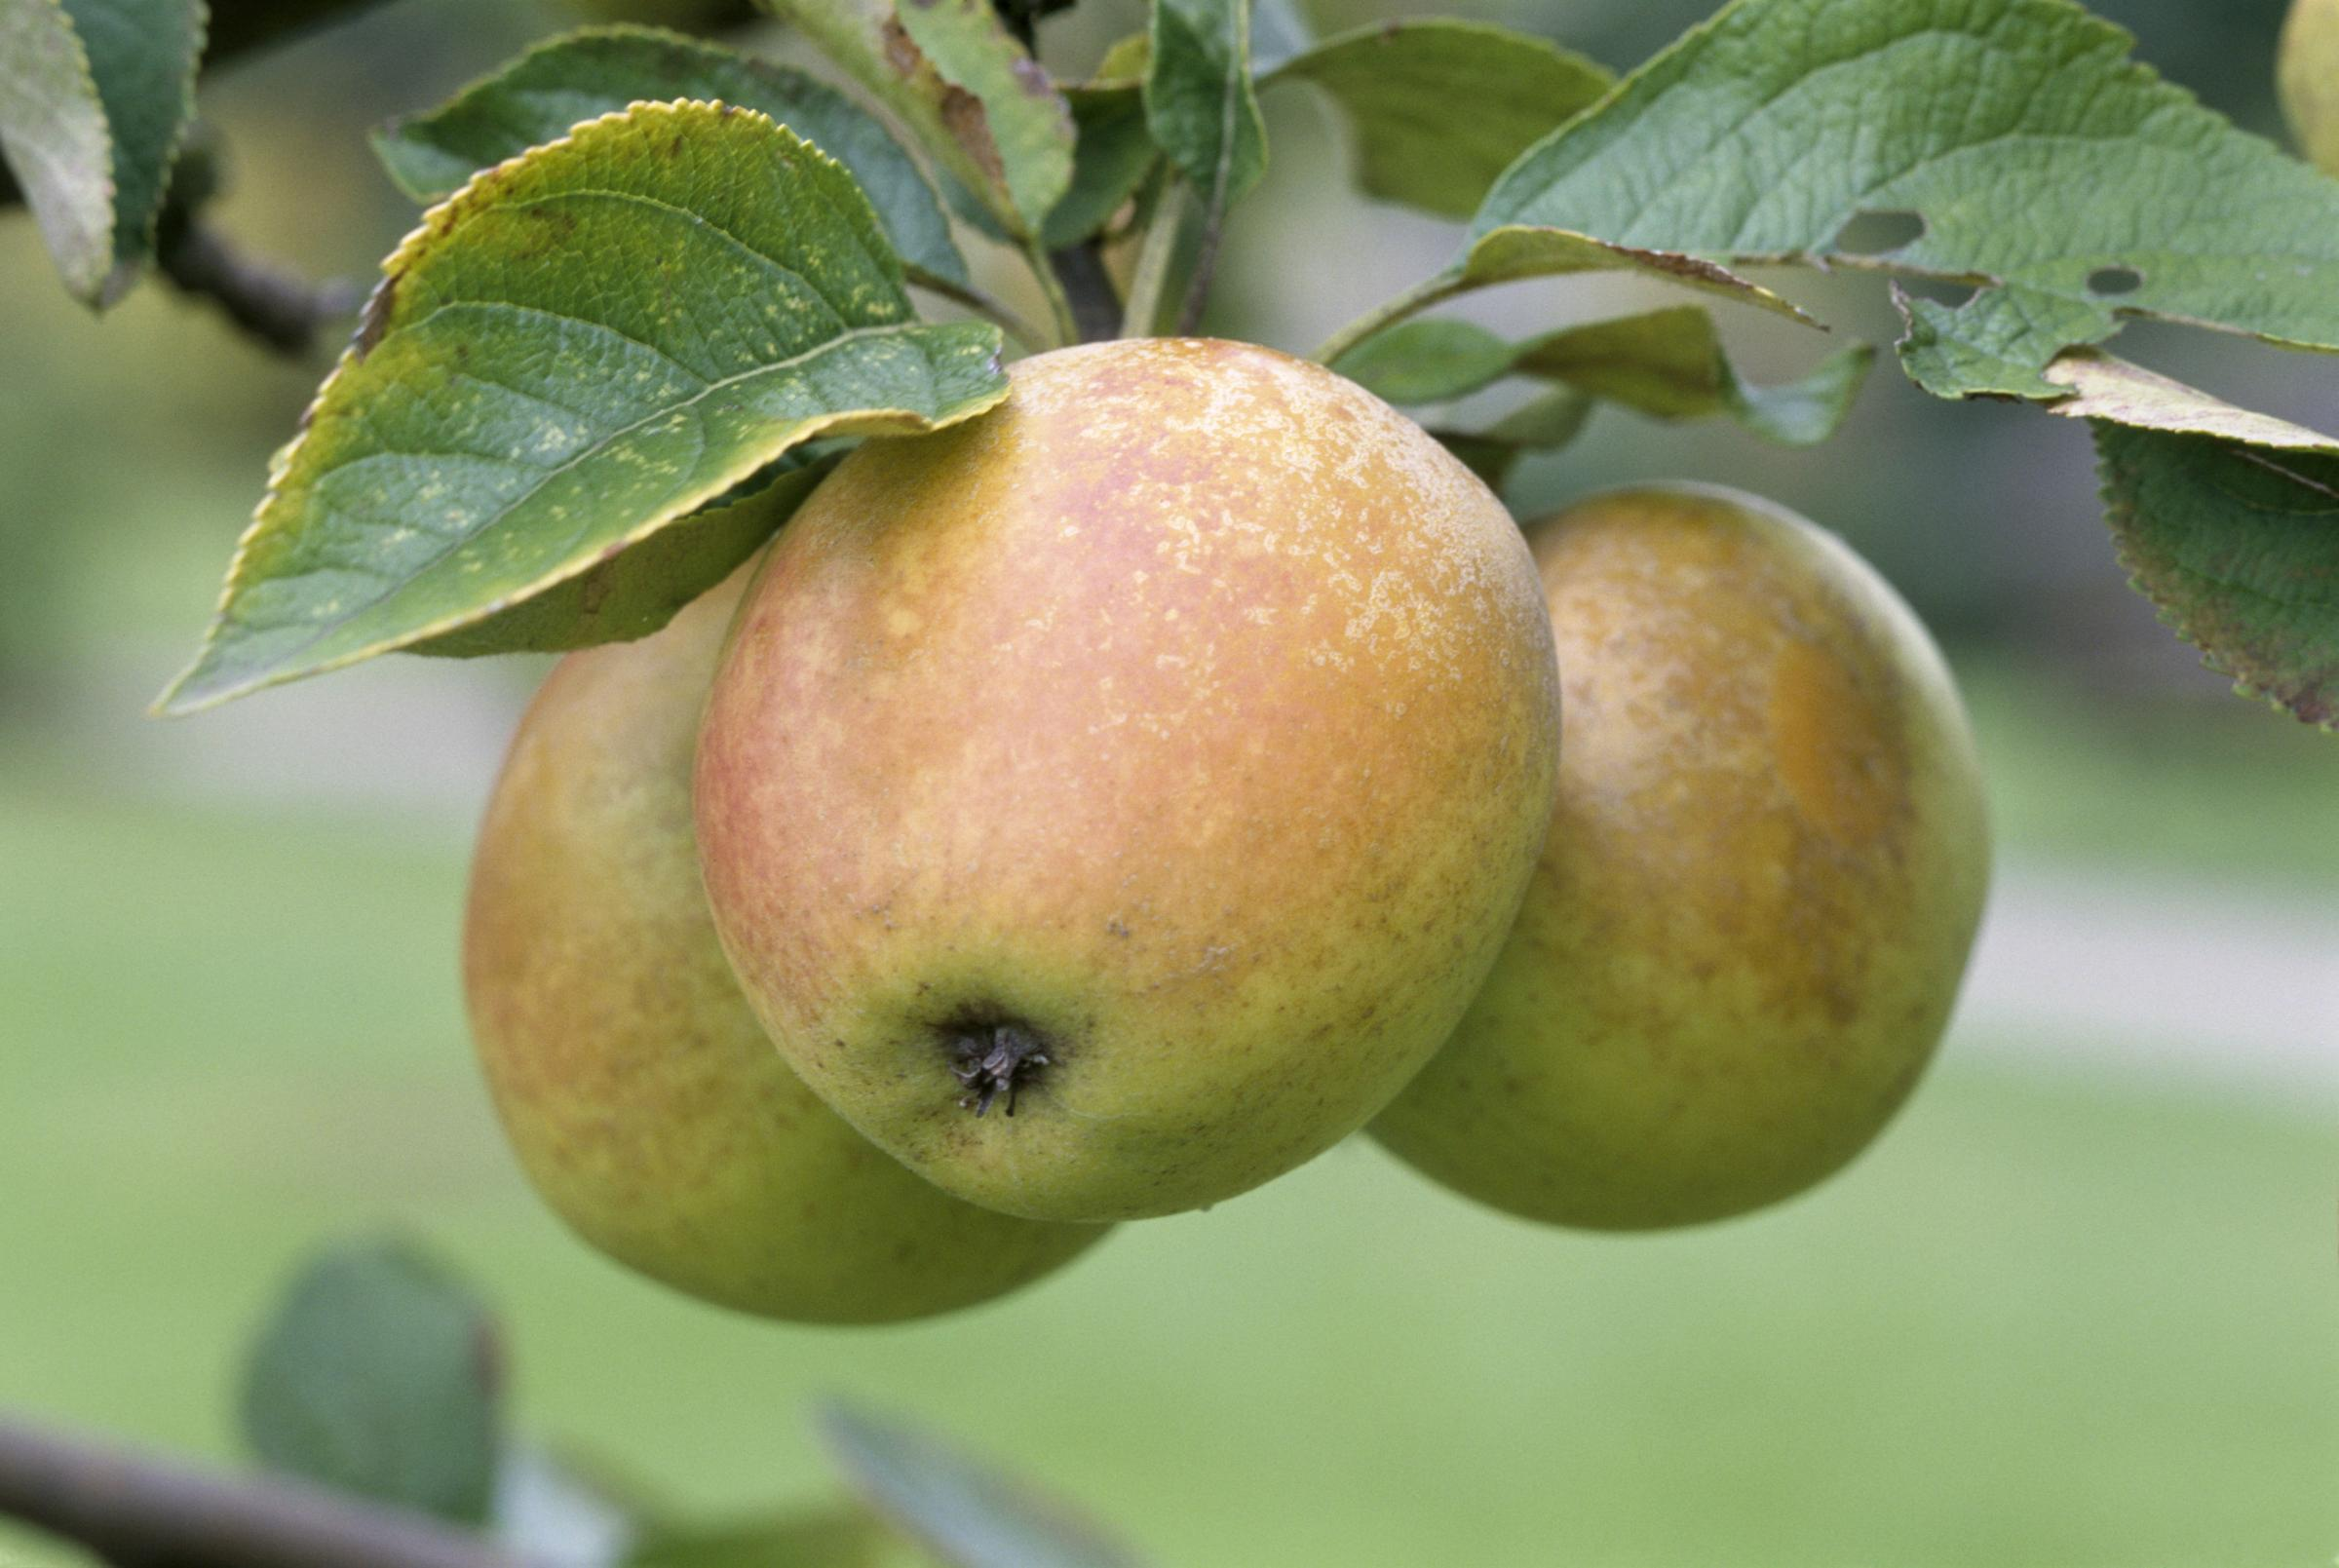 Volunteer for Bradford's annual apple day